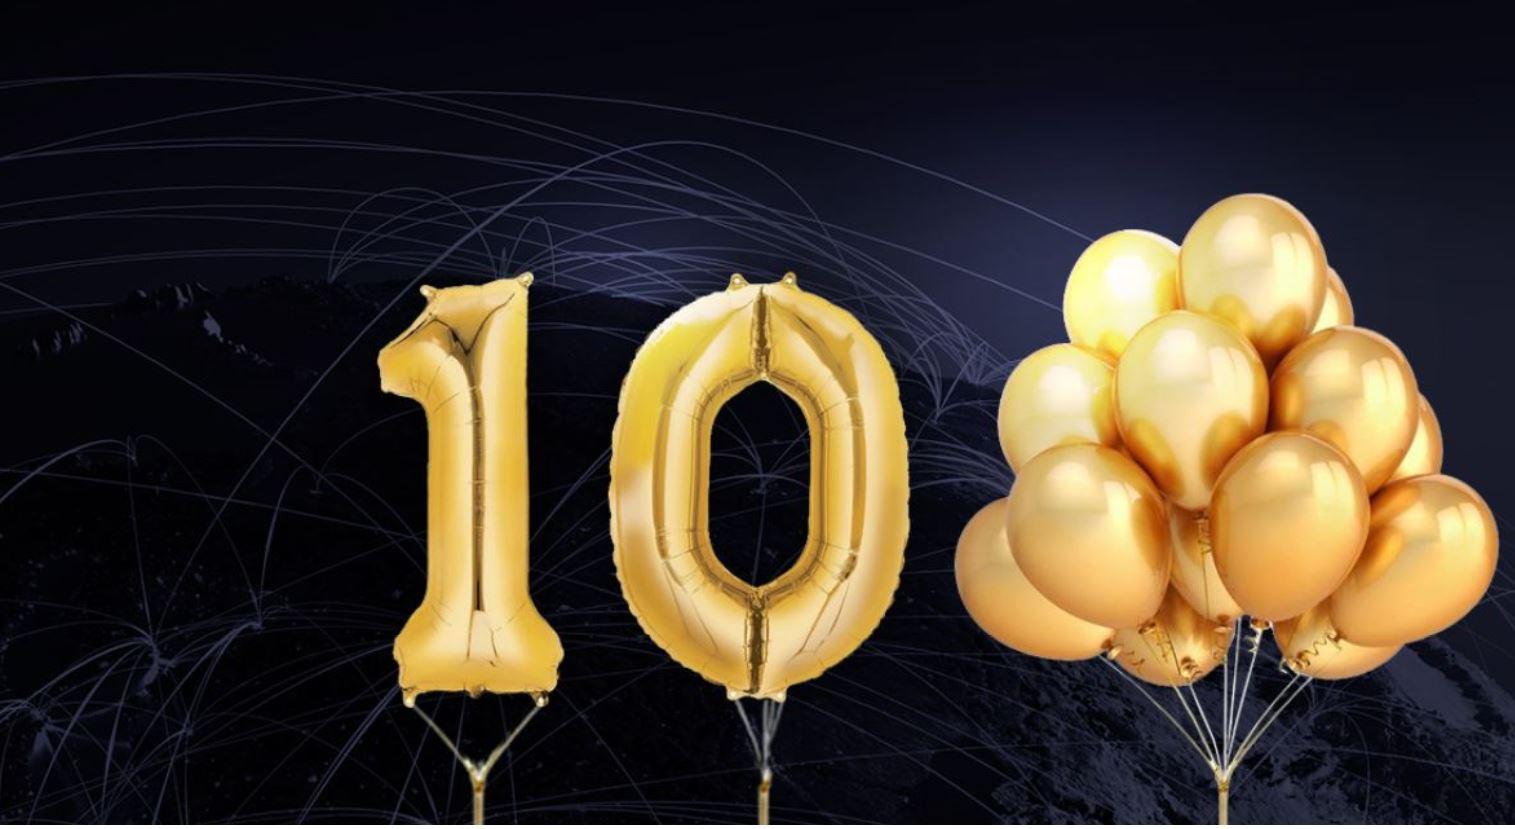 10 lat EMBIQ